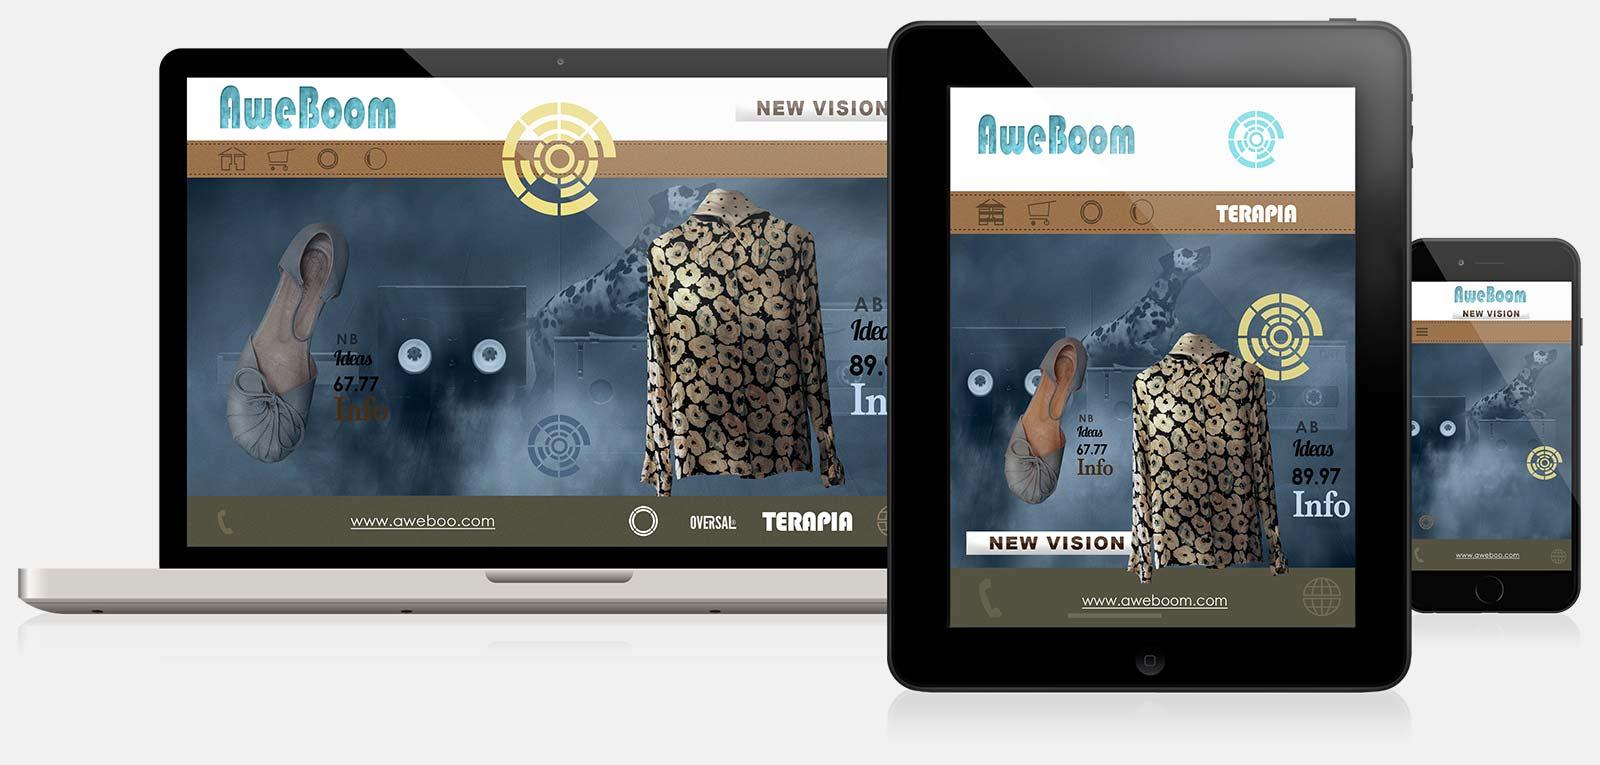 Aweboom responsive web design